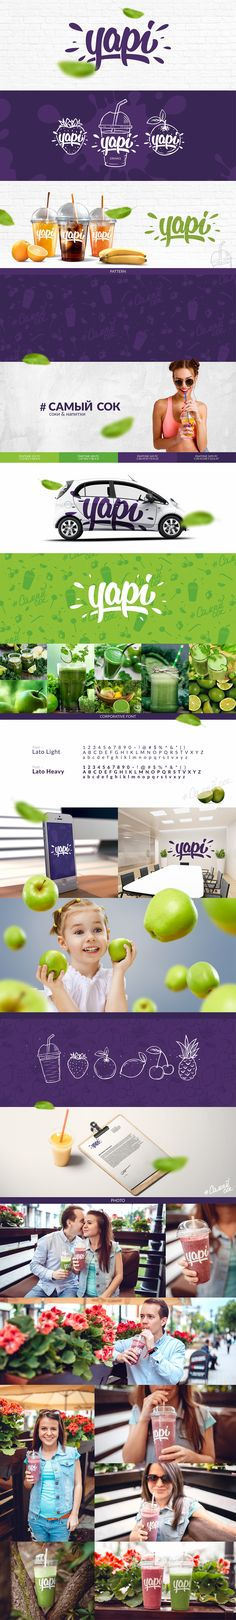 Yapi drinks on Behance Brand Identity Design, Graphic Design Branding, Corporate Design, Logo Branding, Packaging Design, Corporate Identity, Product Branding, Brochure Design, Graphisches Design